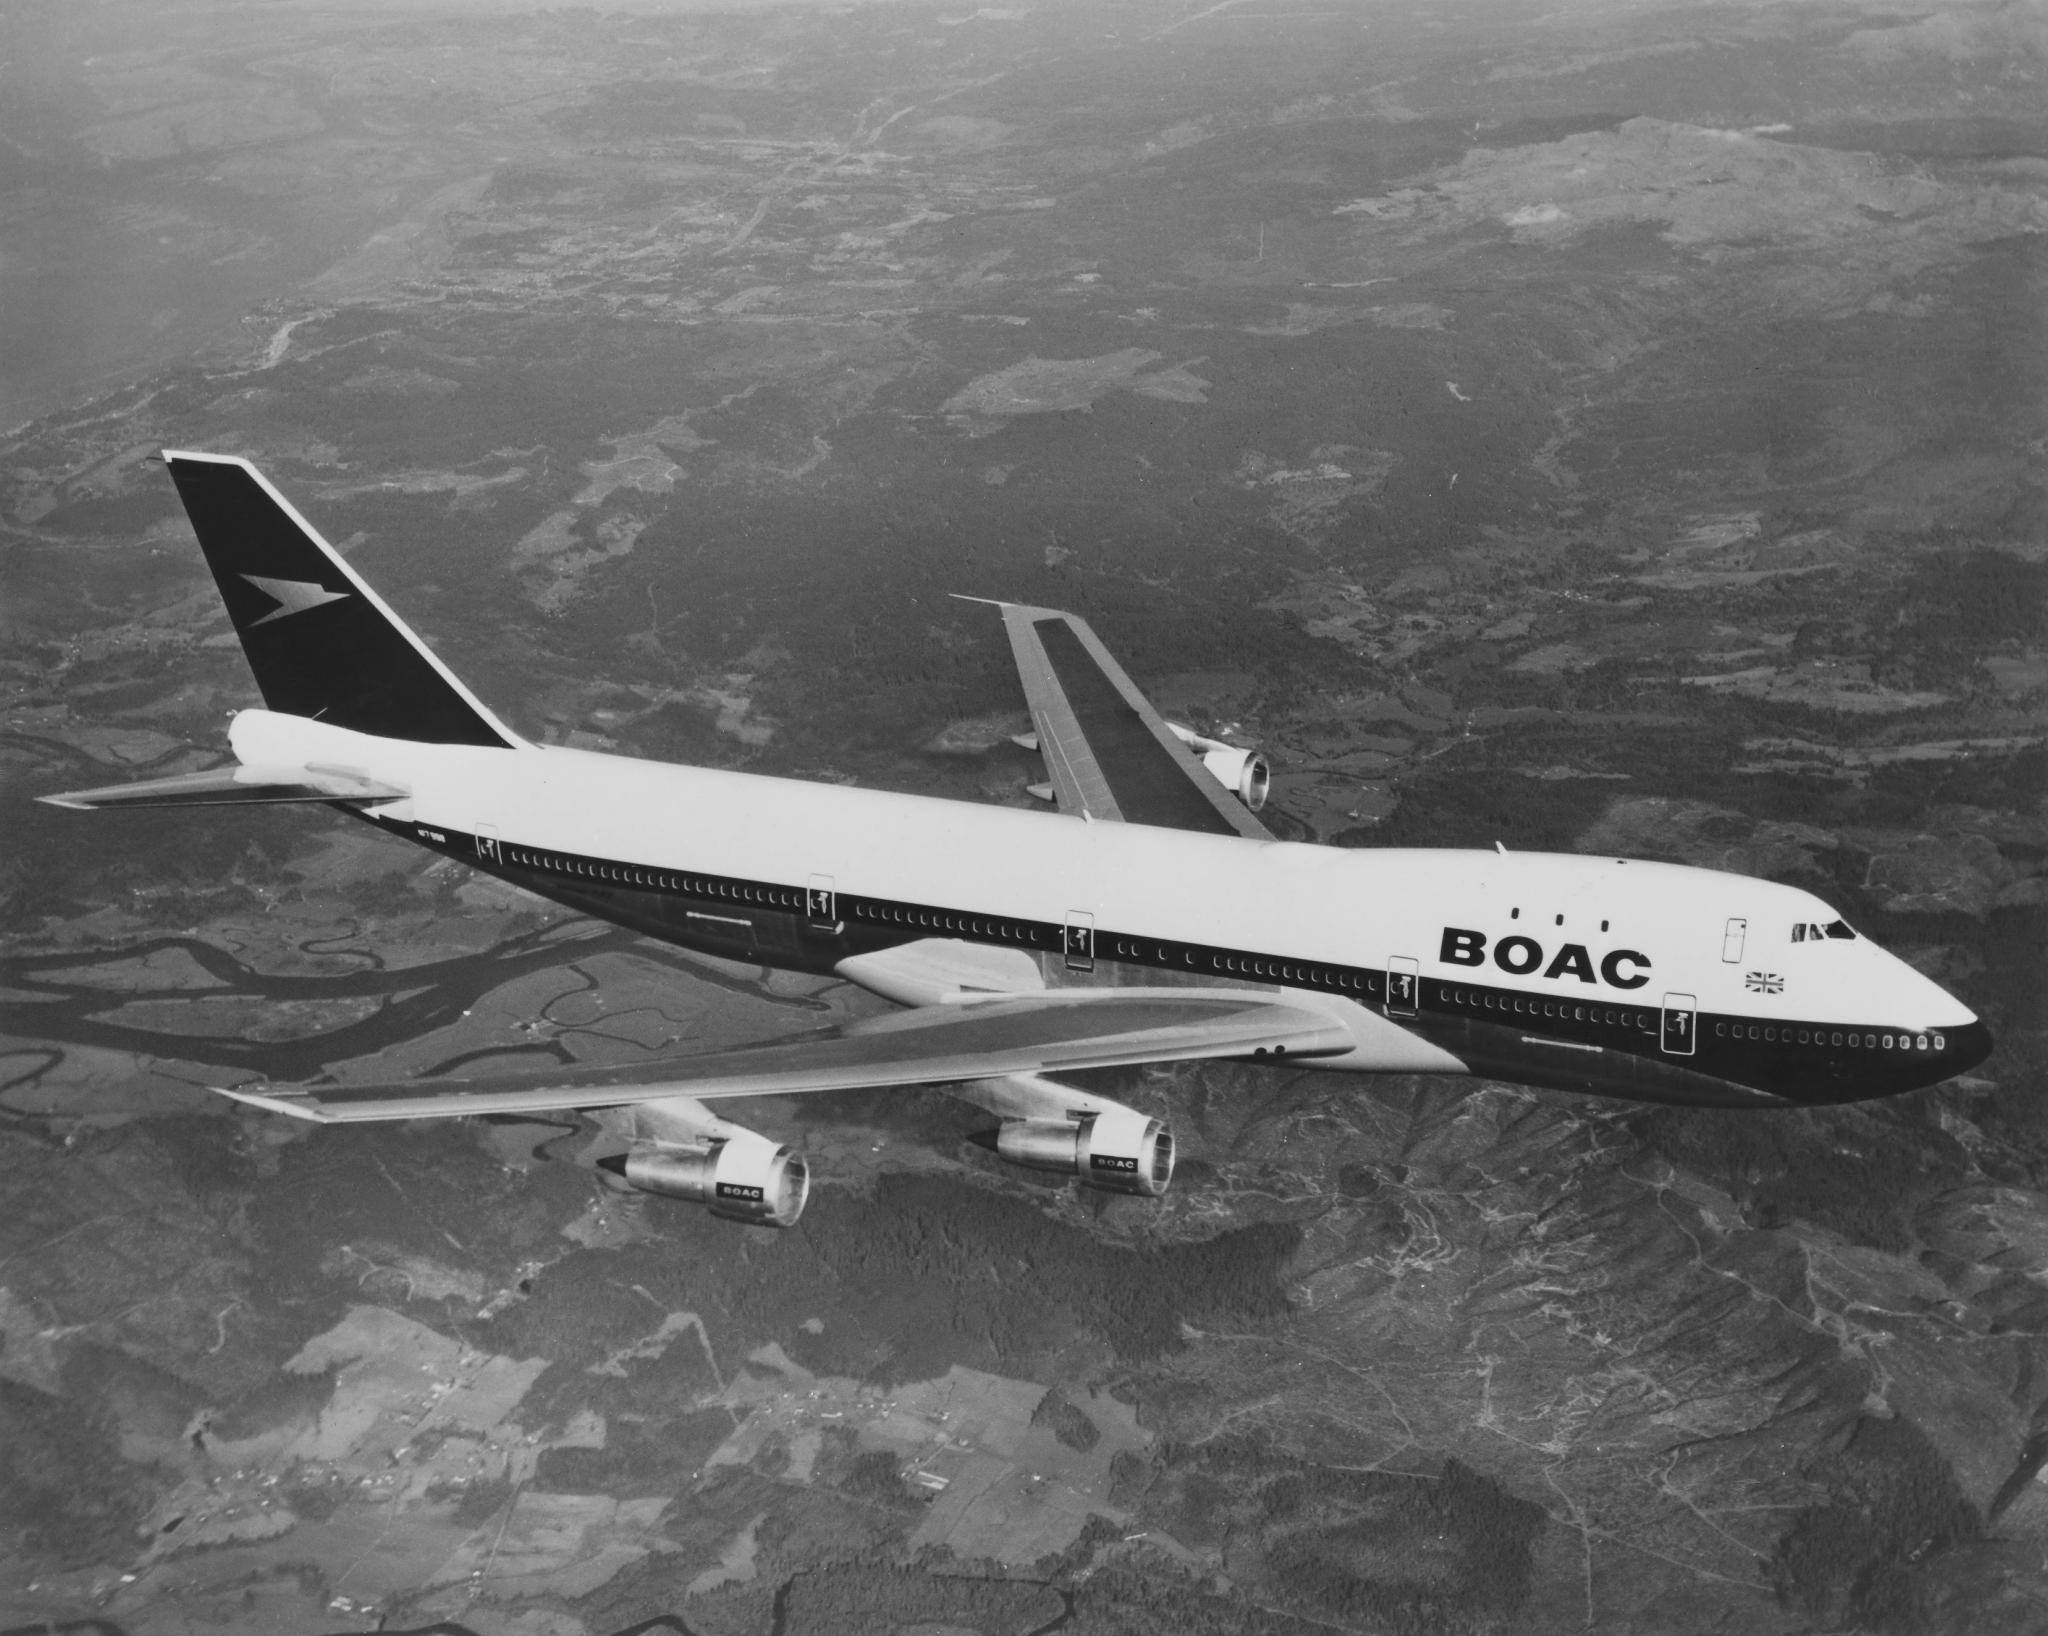 Boeing 747 в оригинальной ливрее BOAC. Фото из архива British Airways